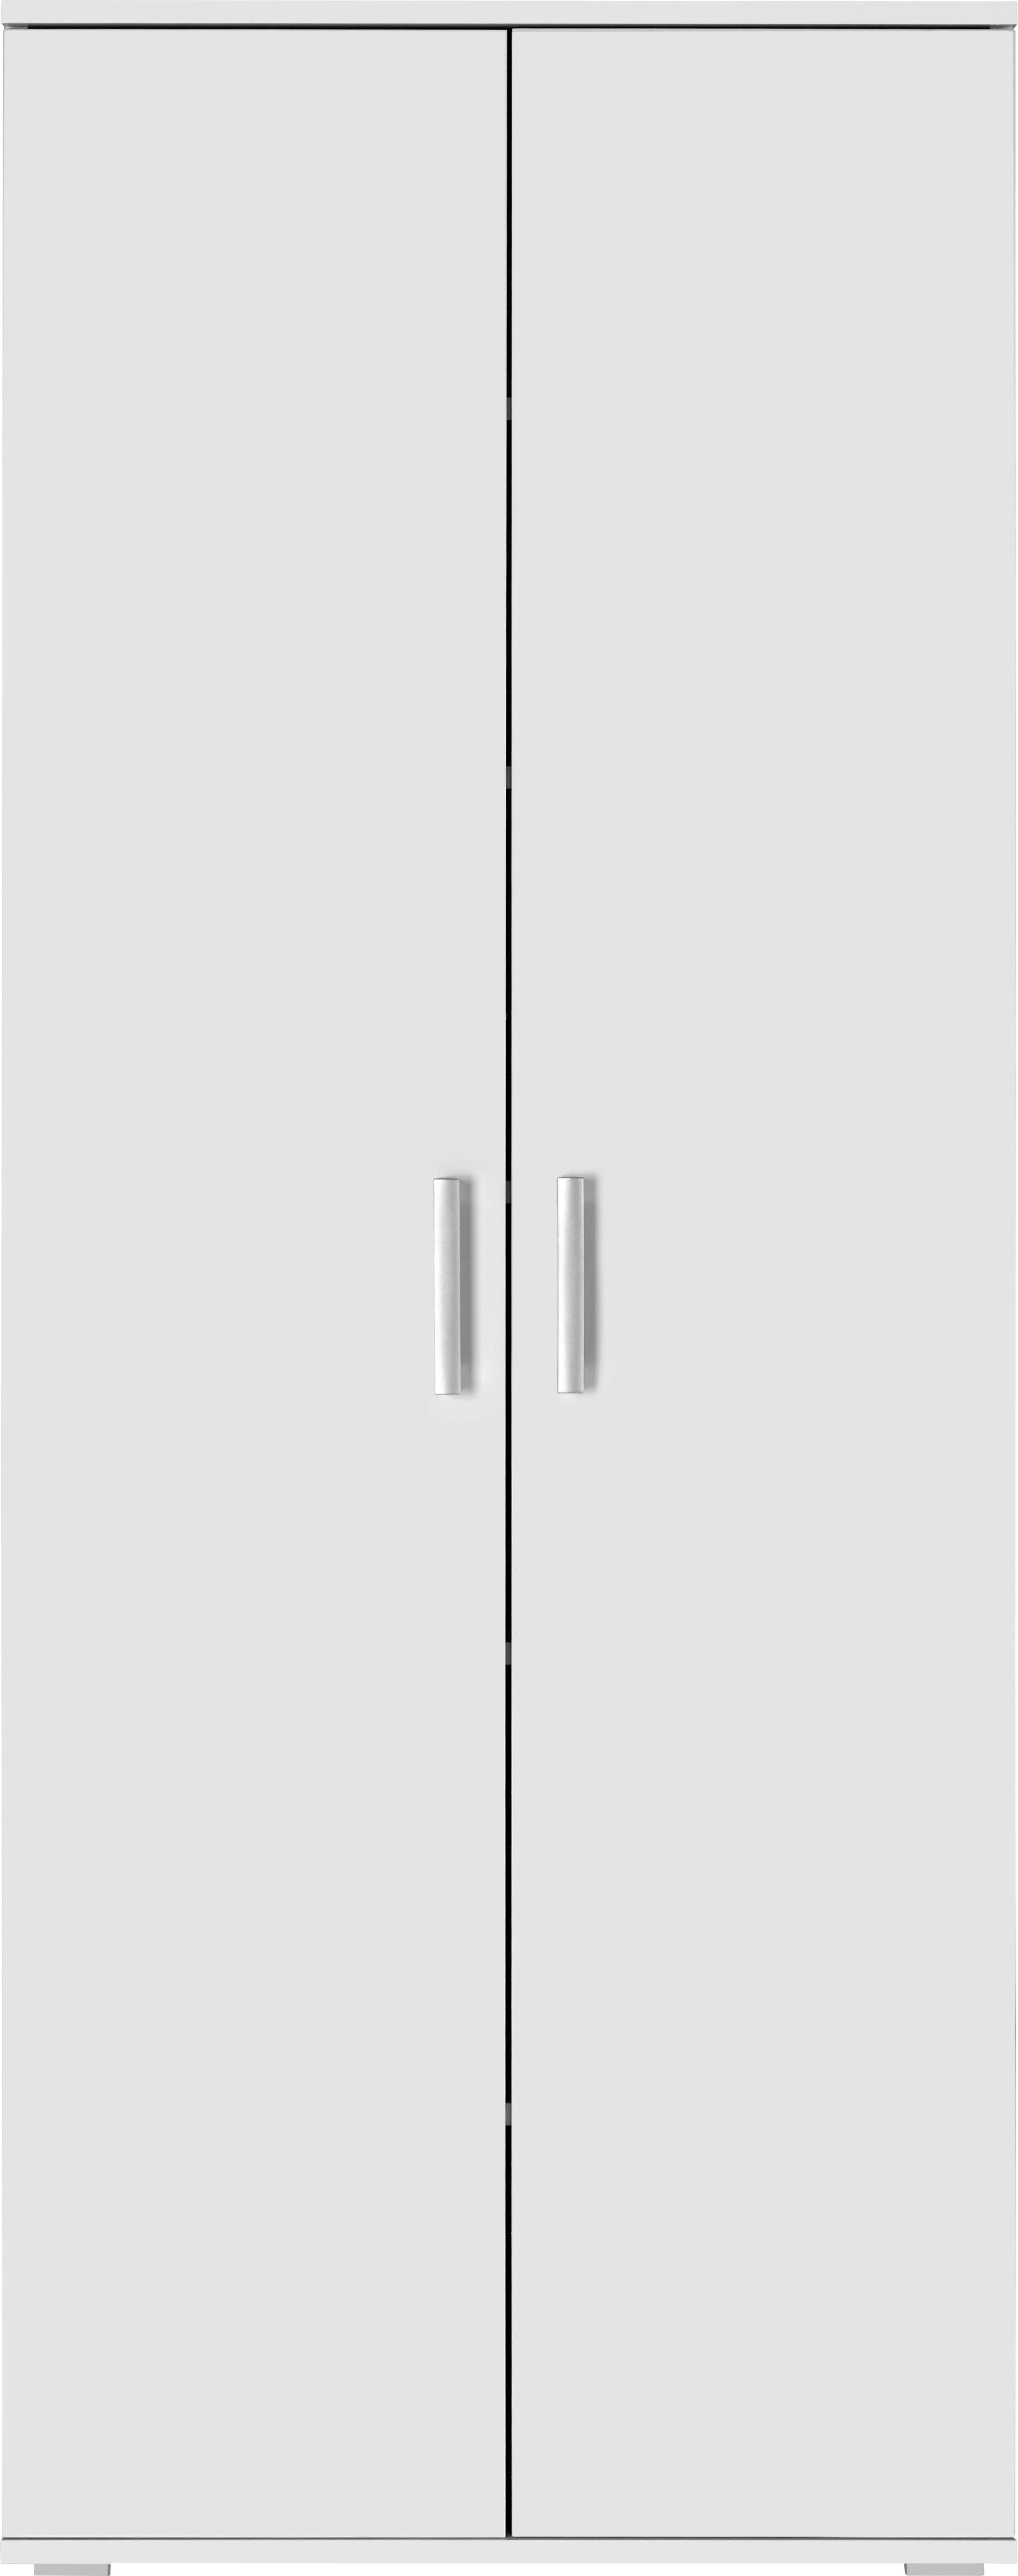 Večnamenska Omara Jimmy - aluminij/bela, Moderno, umetna masa/leseni material (70/179/34cm) - Mömax modern living